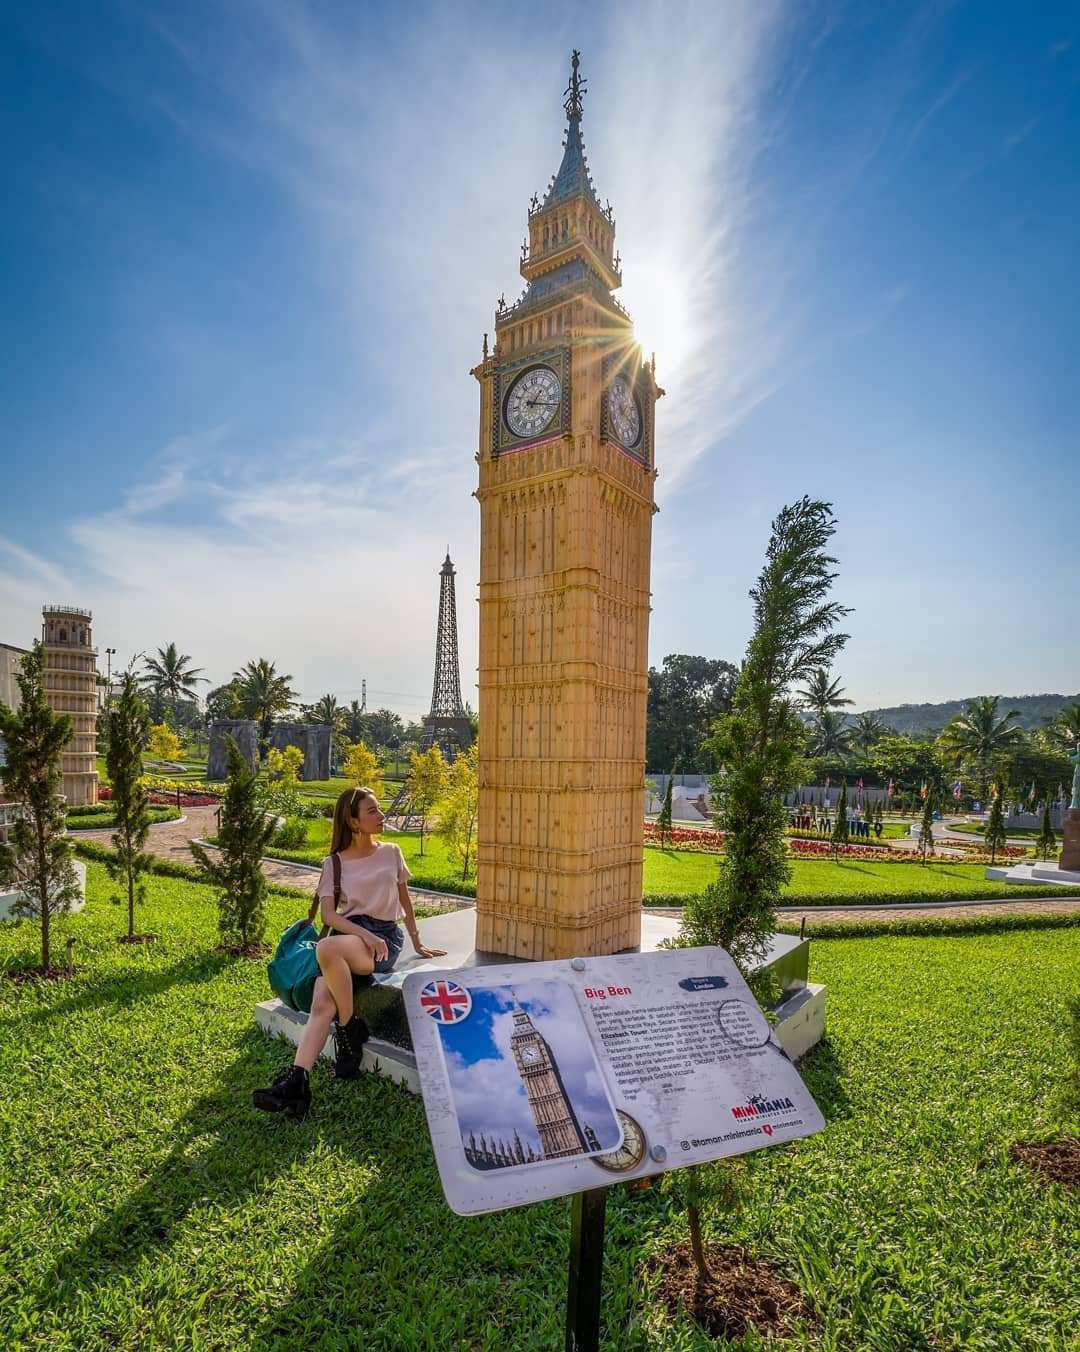 Berfoto Dengan Miniatur Big Ben di Taman Mini Mania Semarang, Image From @wisatasemarang